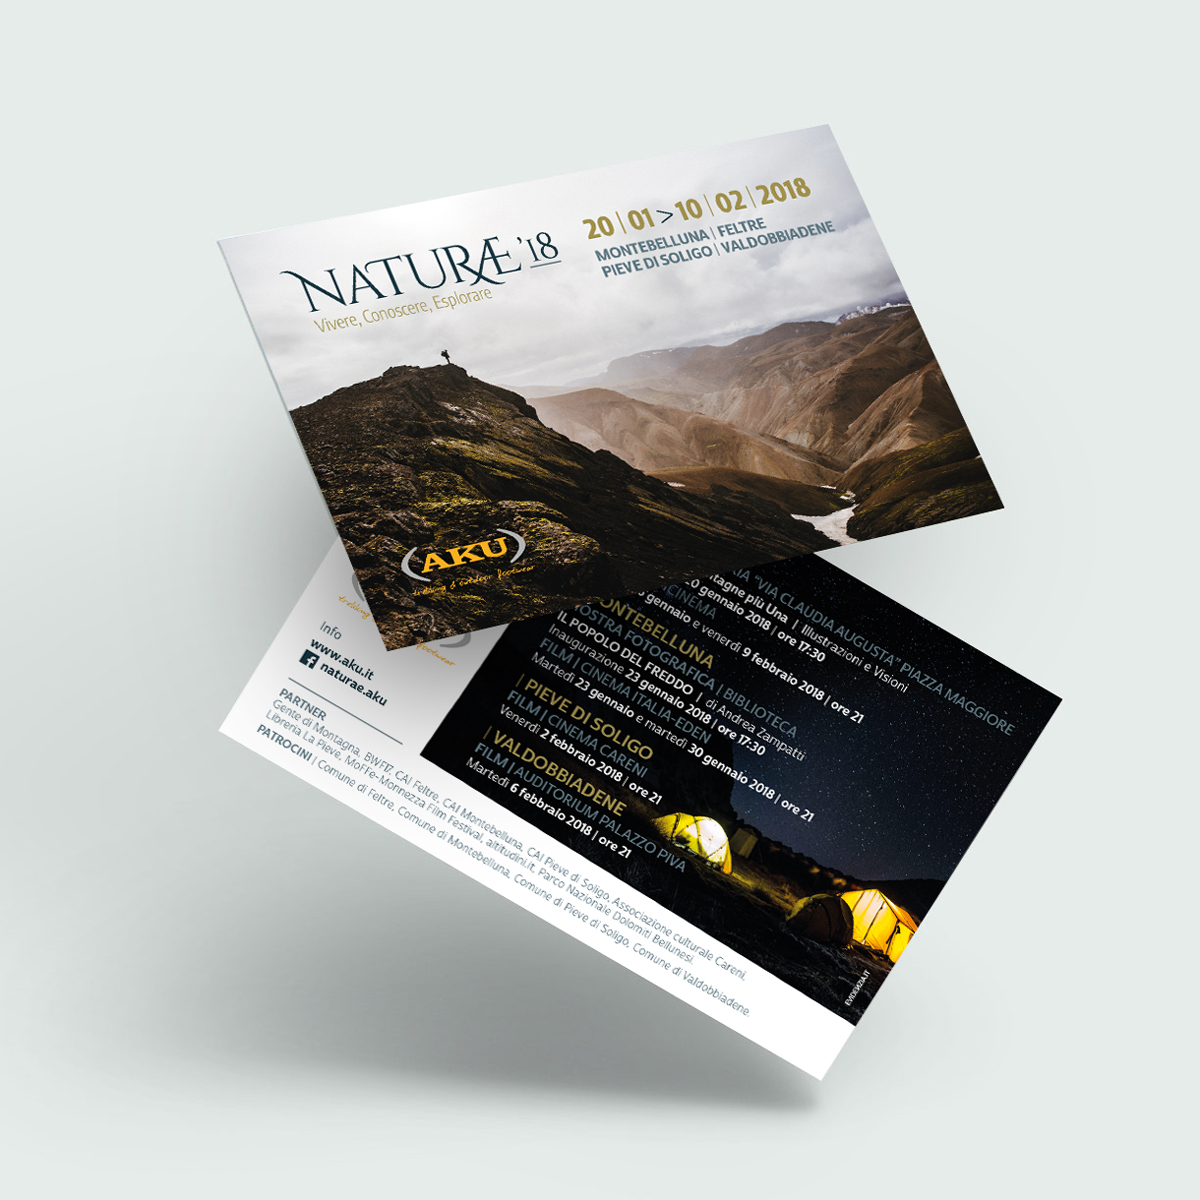 Card AKU-Naturae